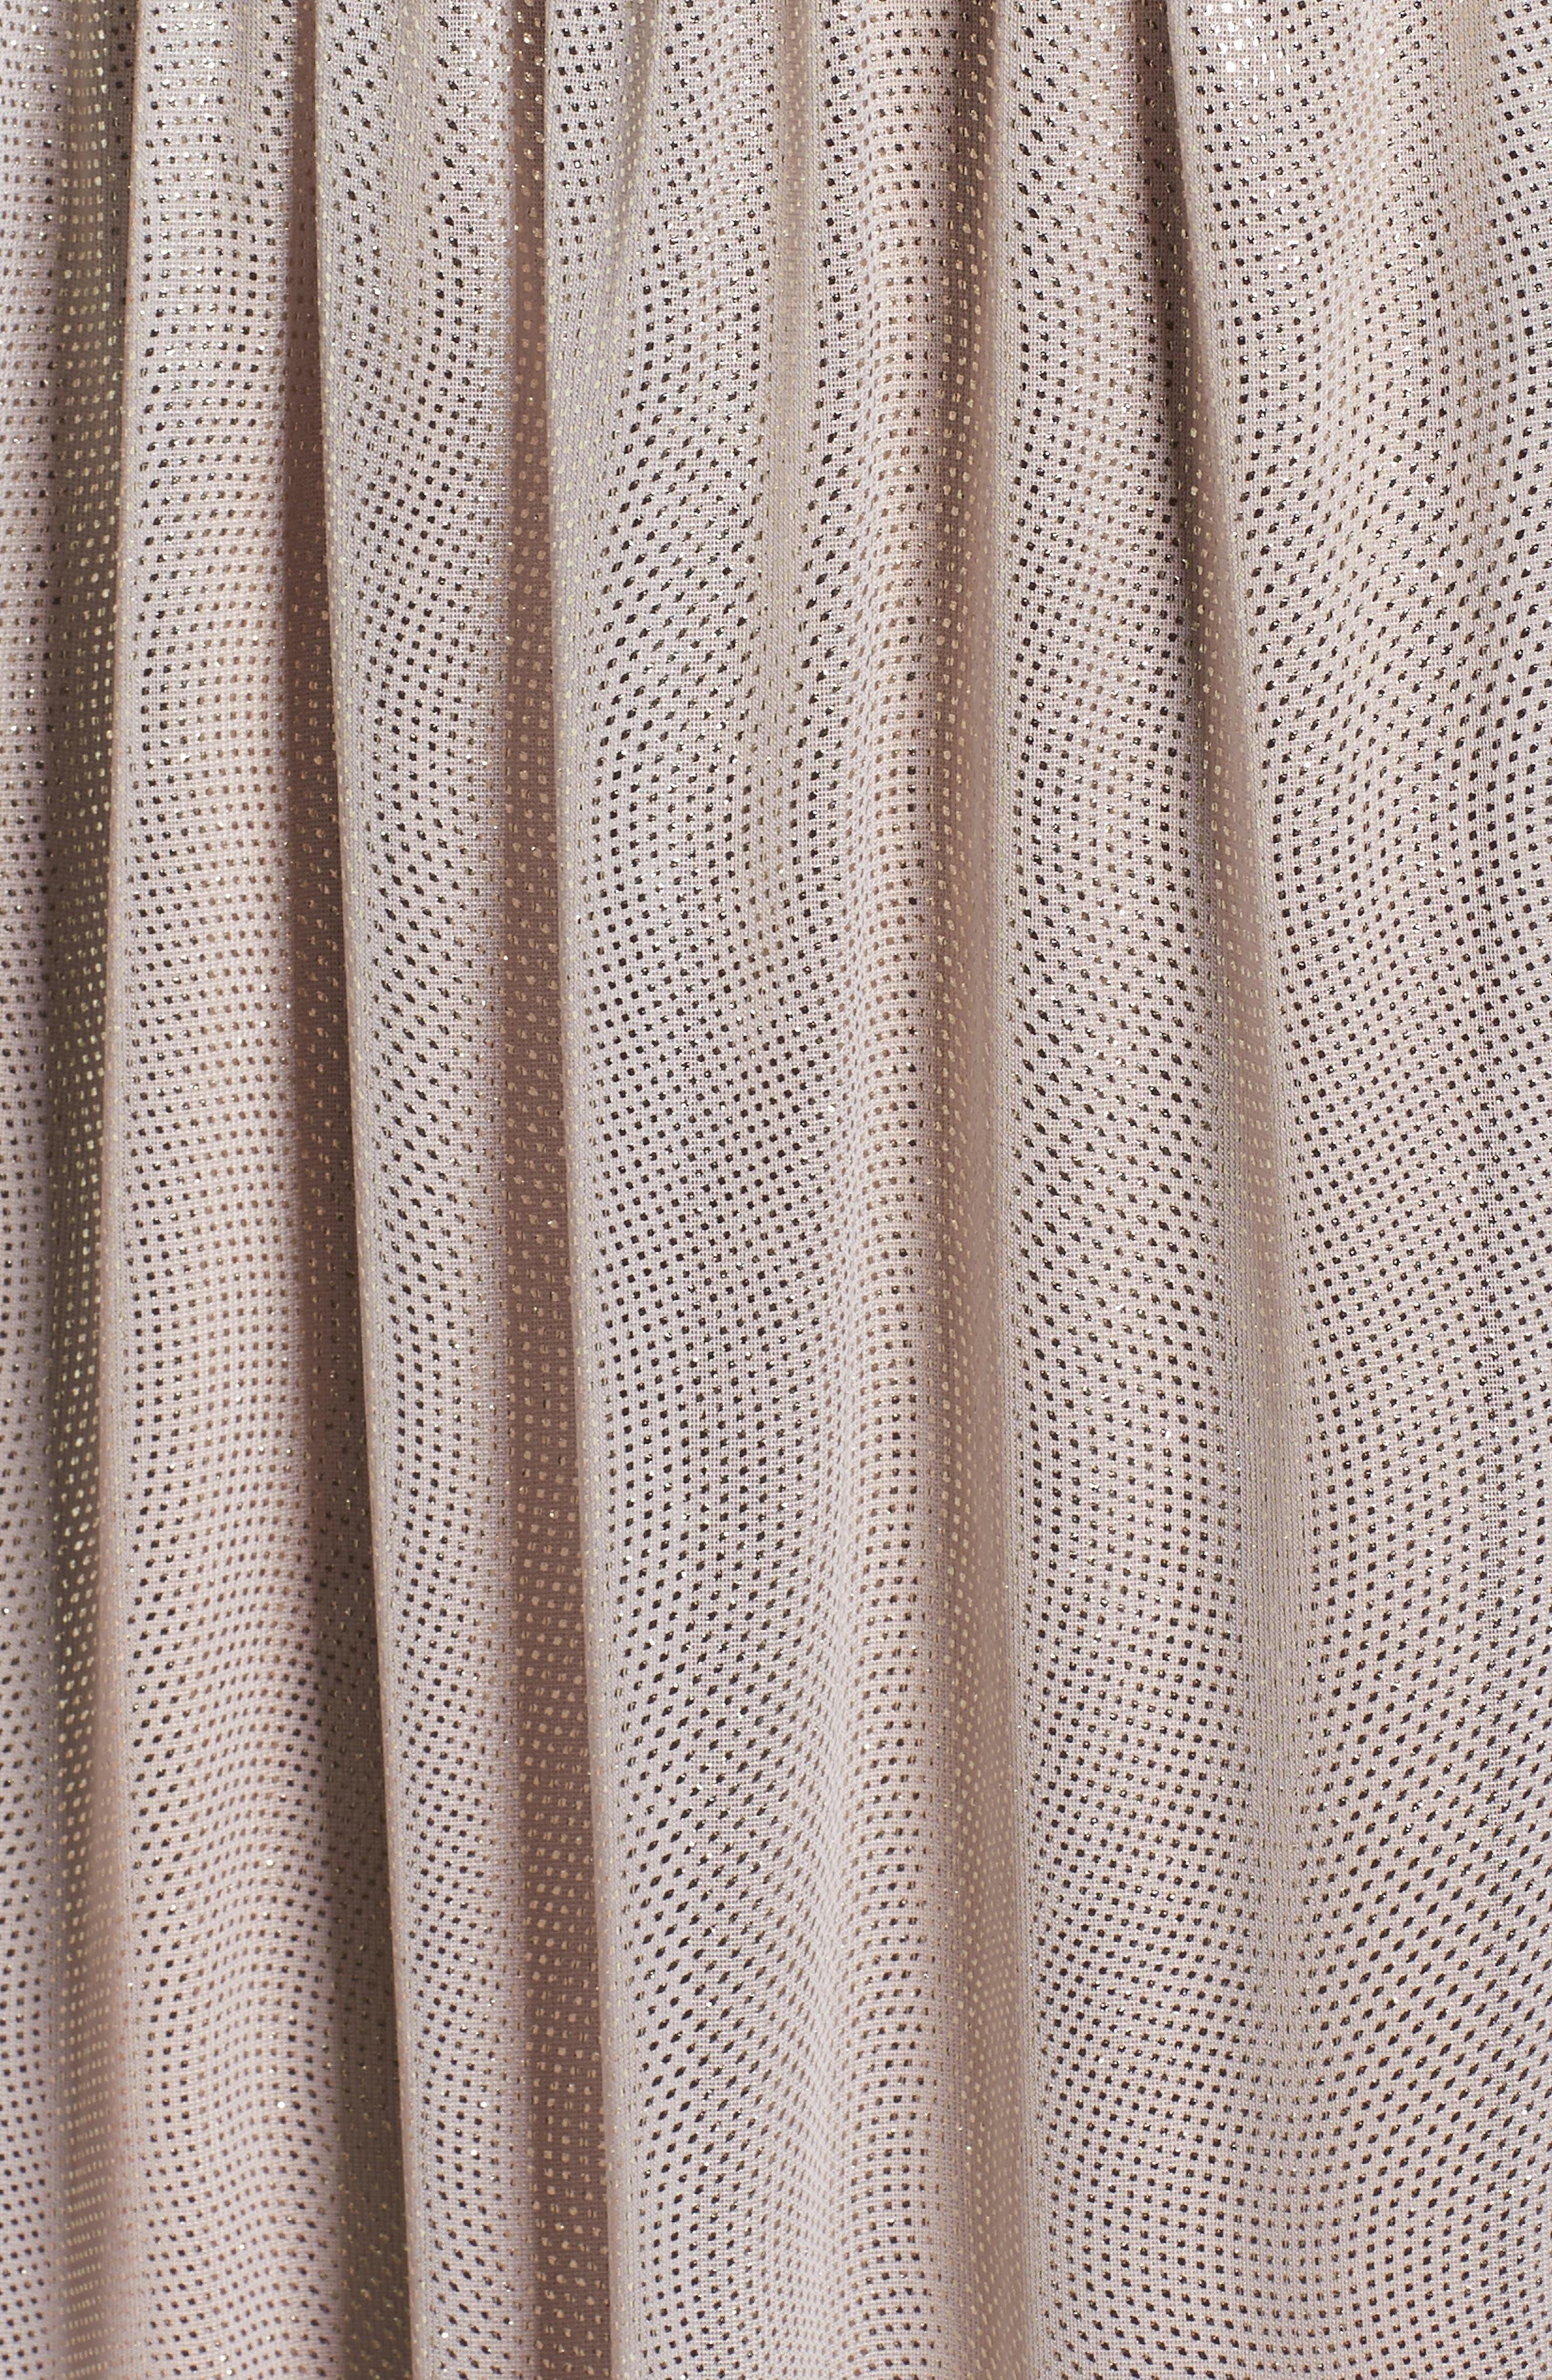 Metallic Gown,                             Alternate thumbnail 5, color,                             710